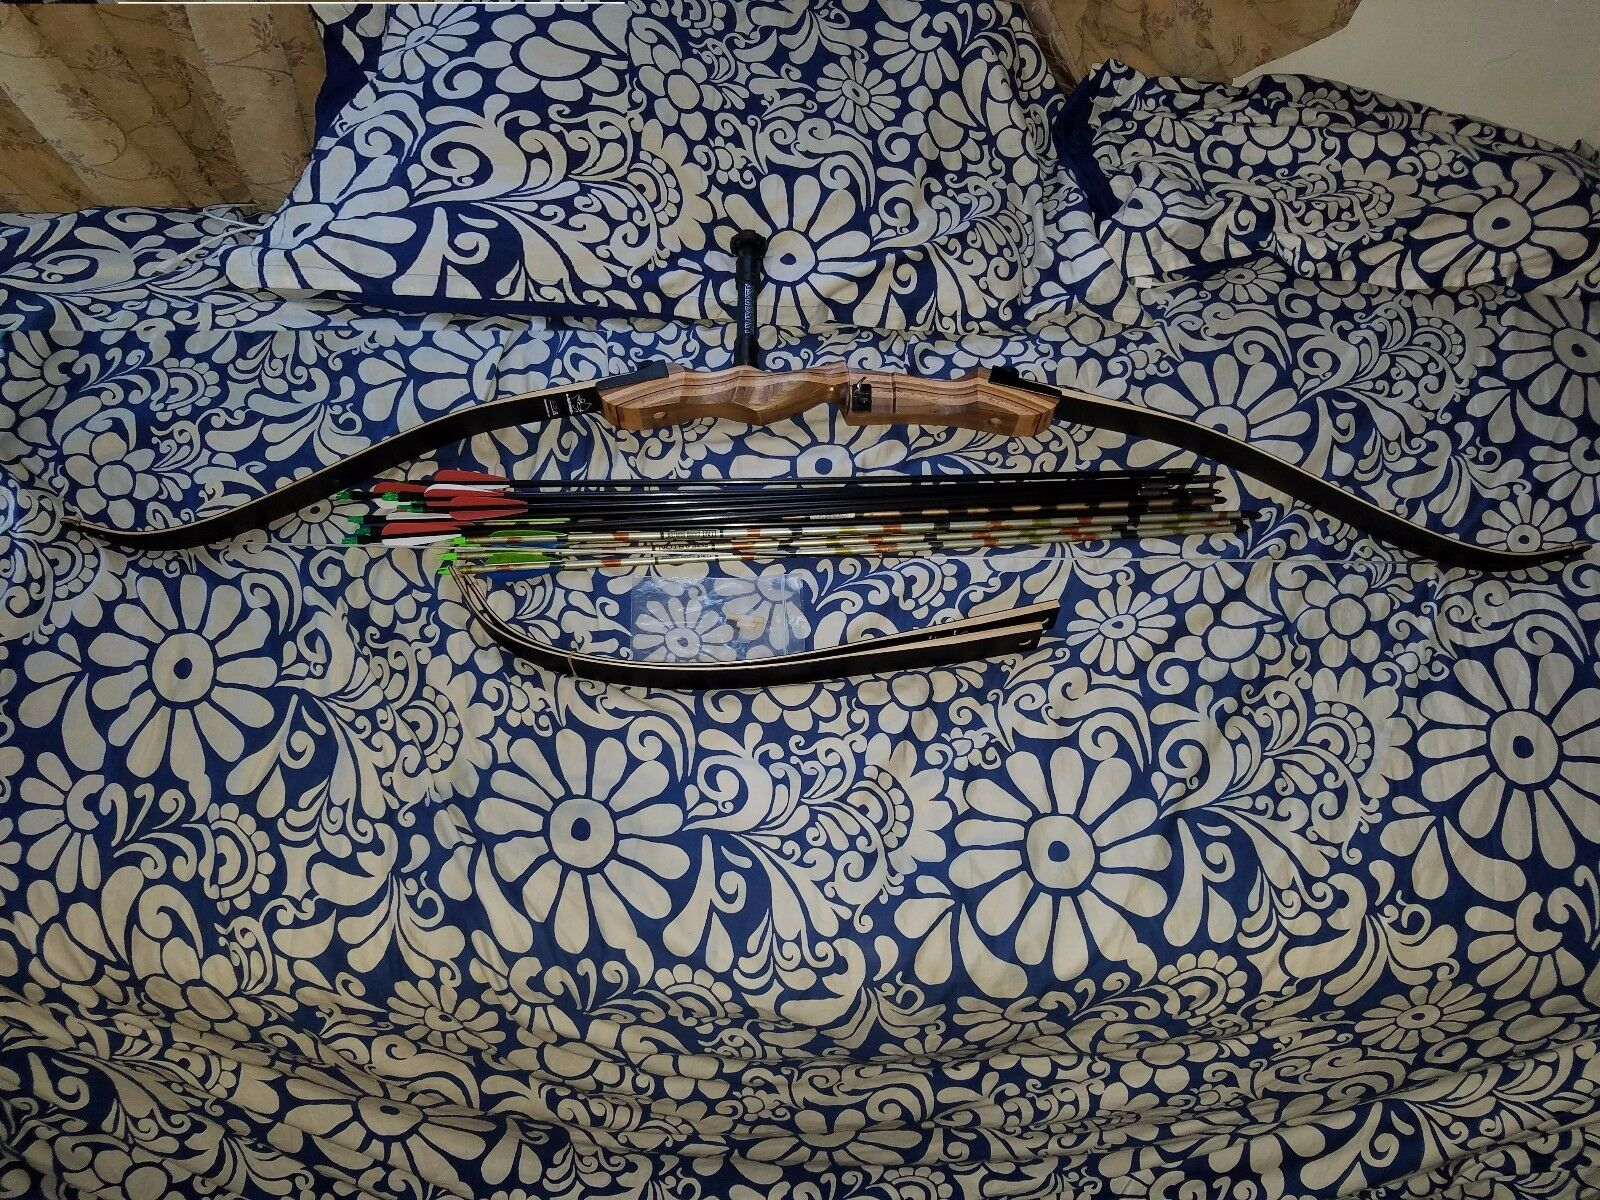 2016 Fleetwood Archery Monarch Takedown Recurve Bow 62  R H 35& W  Arrows